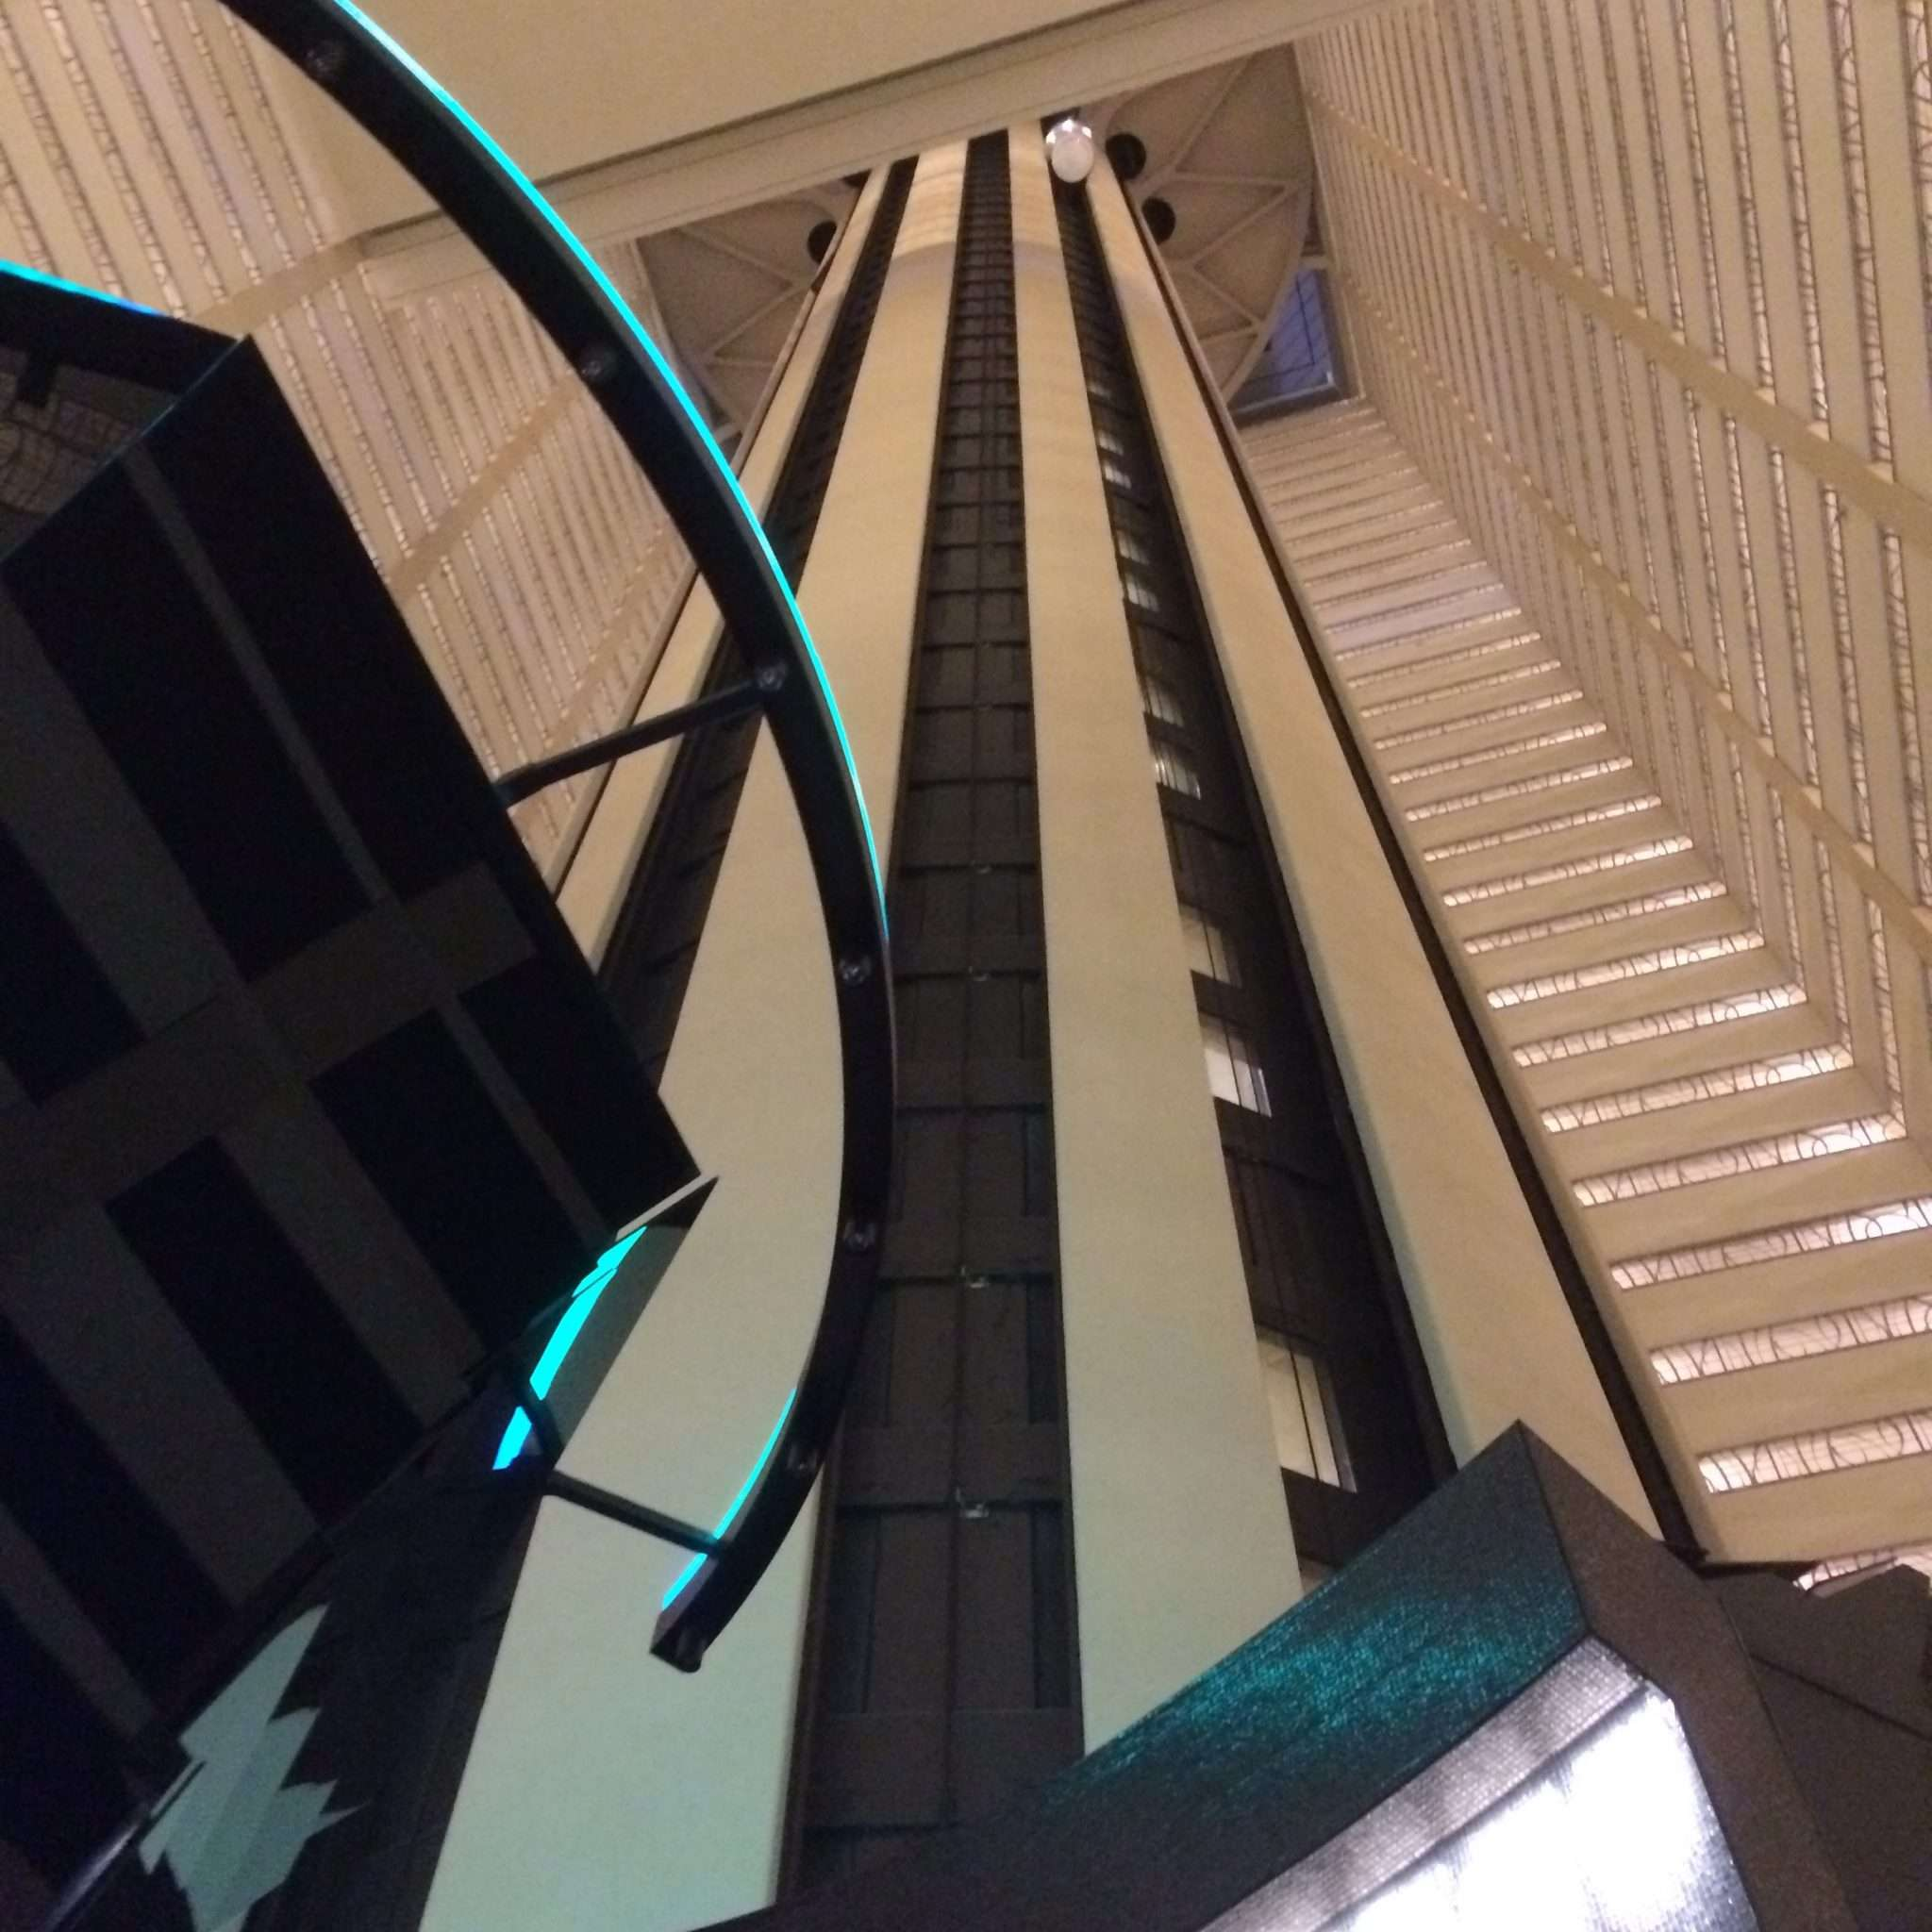 Vogue Knitting Live NYC - The crazy glass elevator